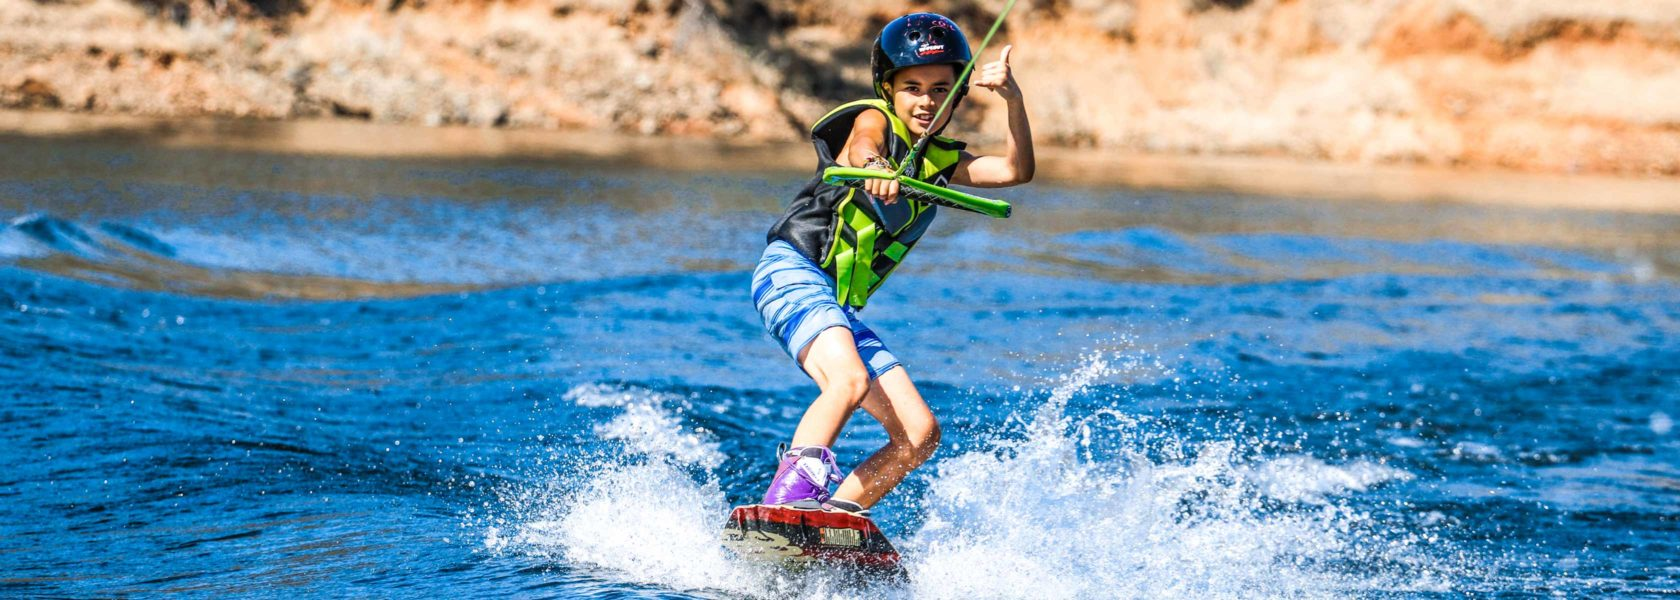 A camper waterskiing